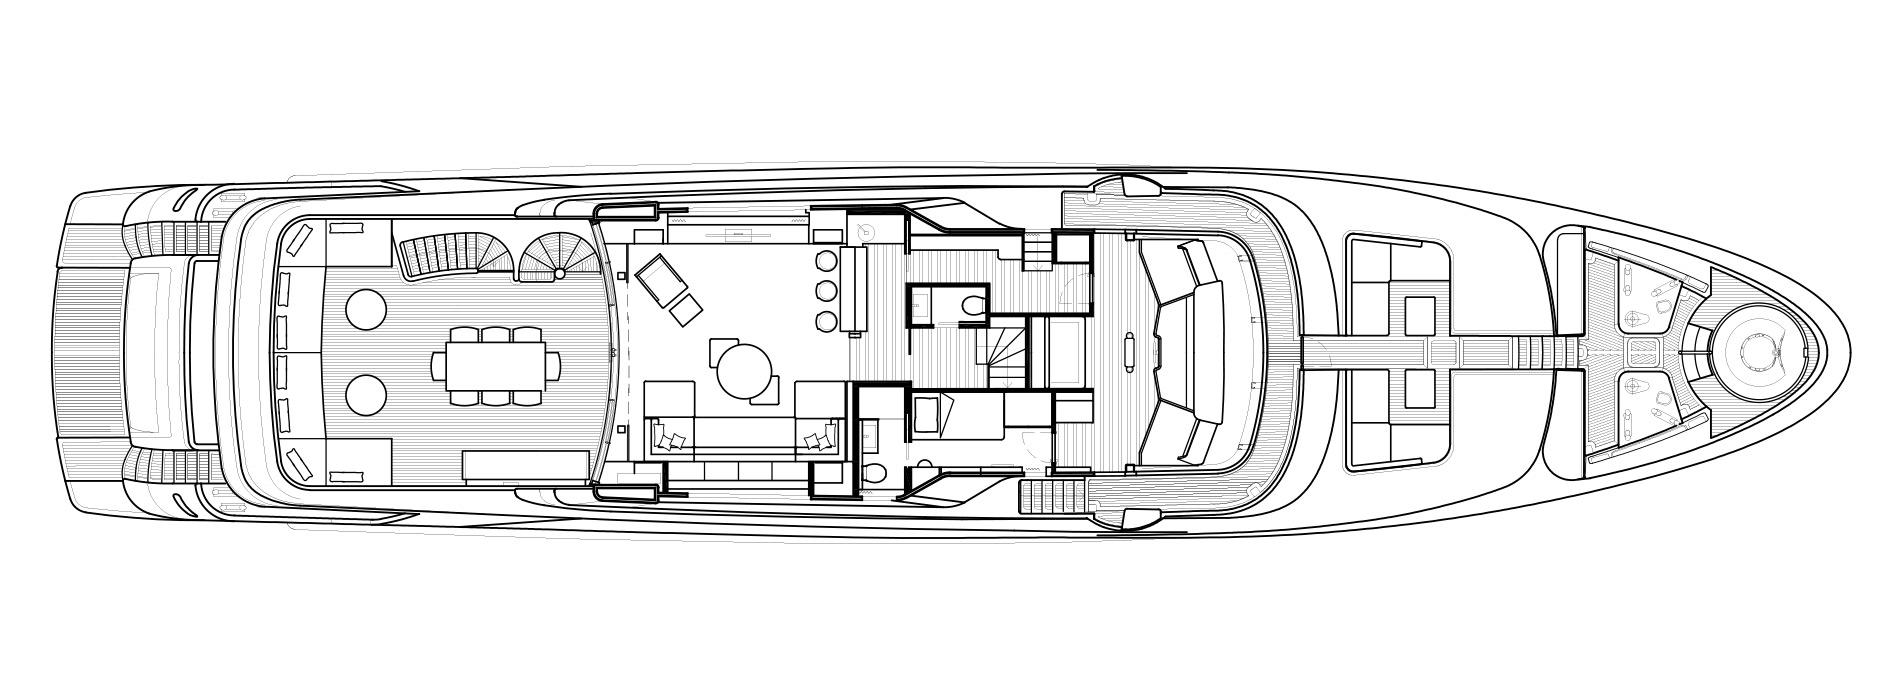 Sanlorenzo Yachts SD126 Cubierta superior Versione B